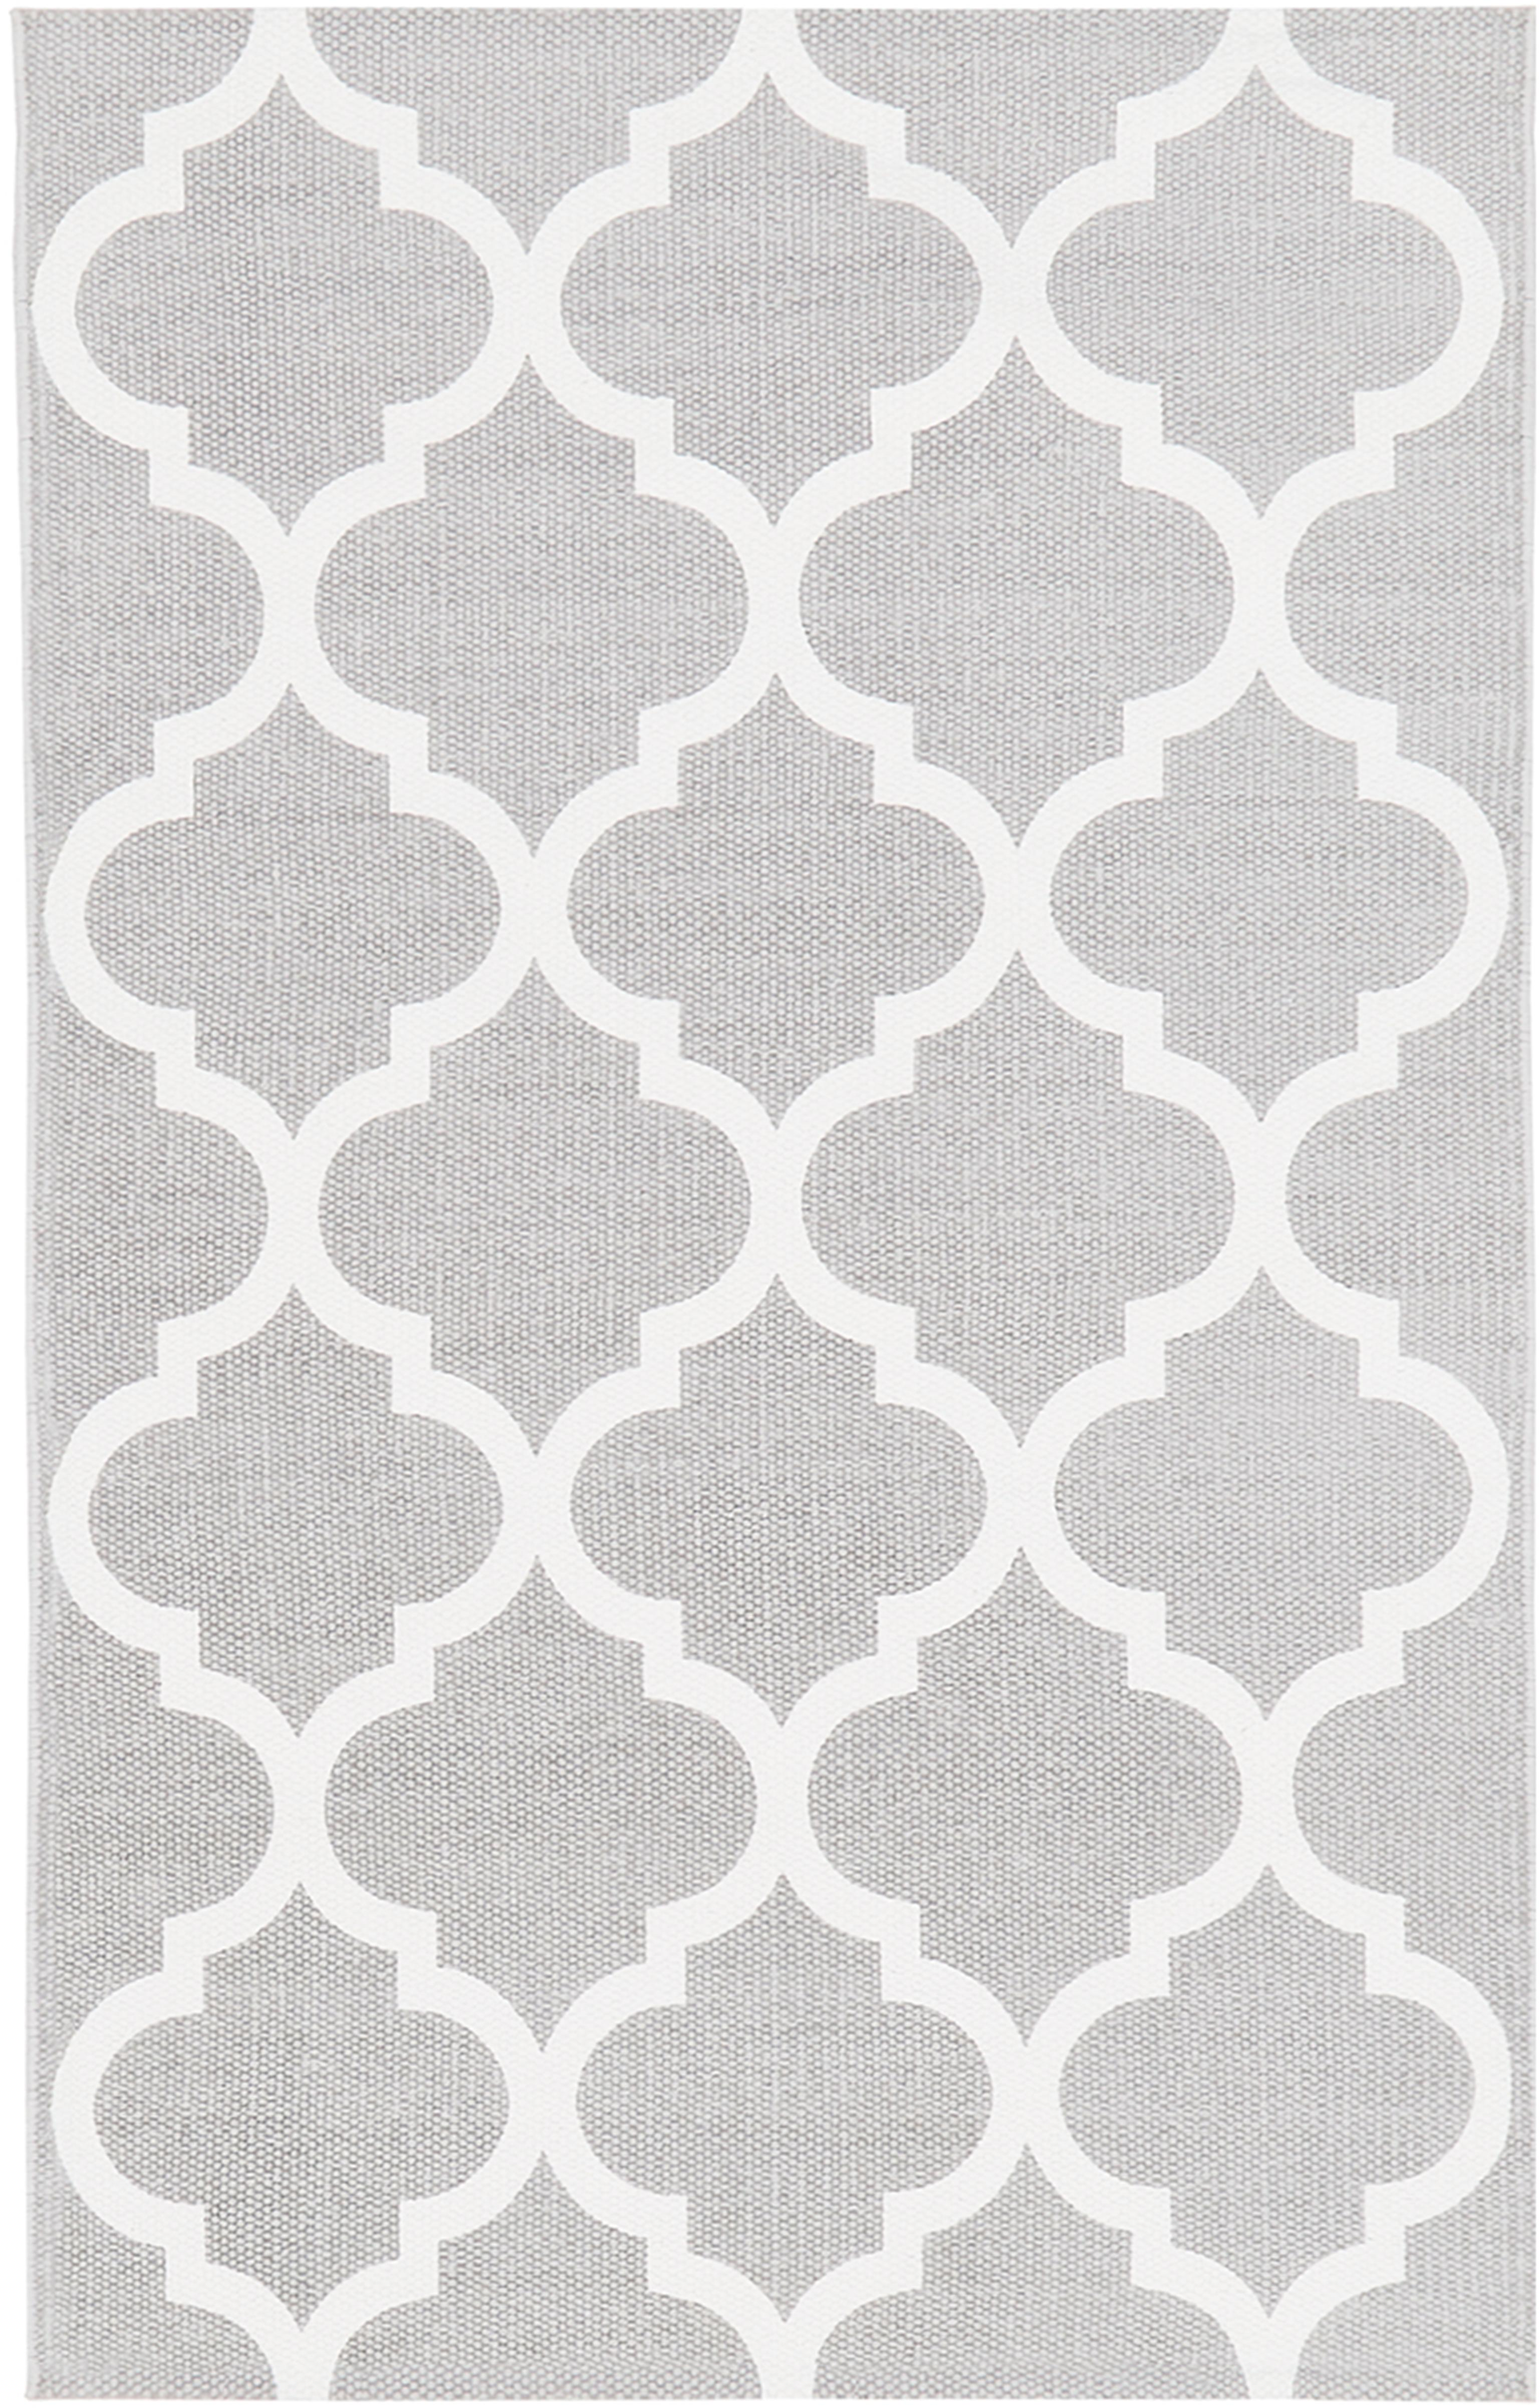 Flachgewebter Baumwollteppich Amira in Grau/Weiß, 100% Baumwolle, Hellgrau, Cremeweiß, B 50 x L 80 cm (Größe XXS)